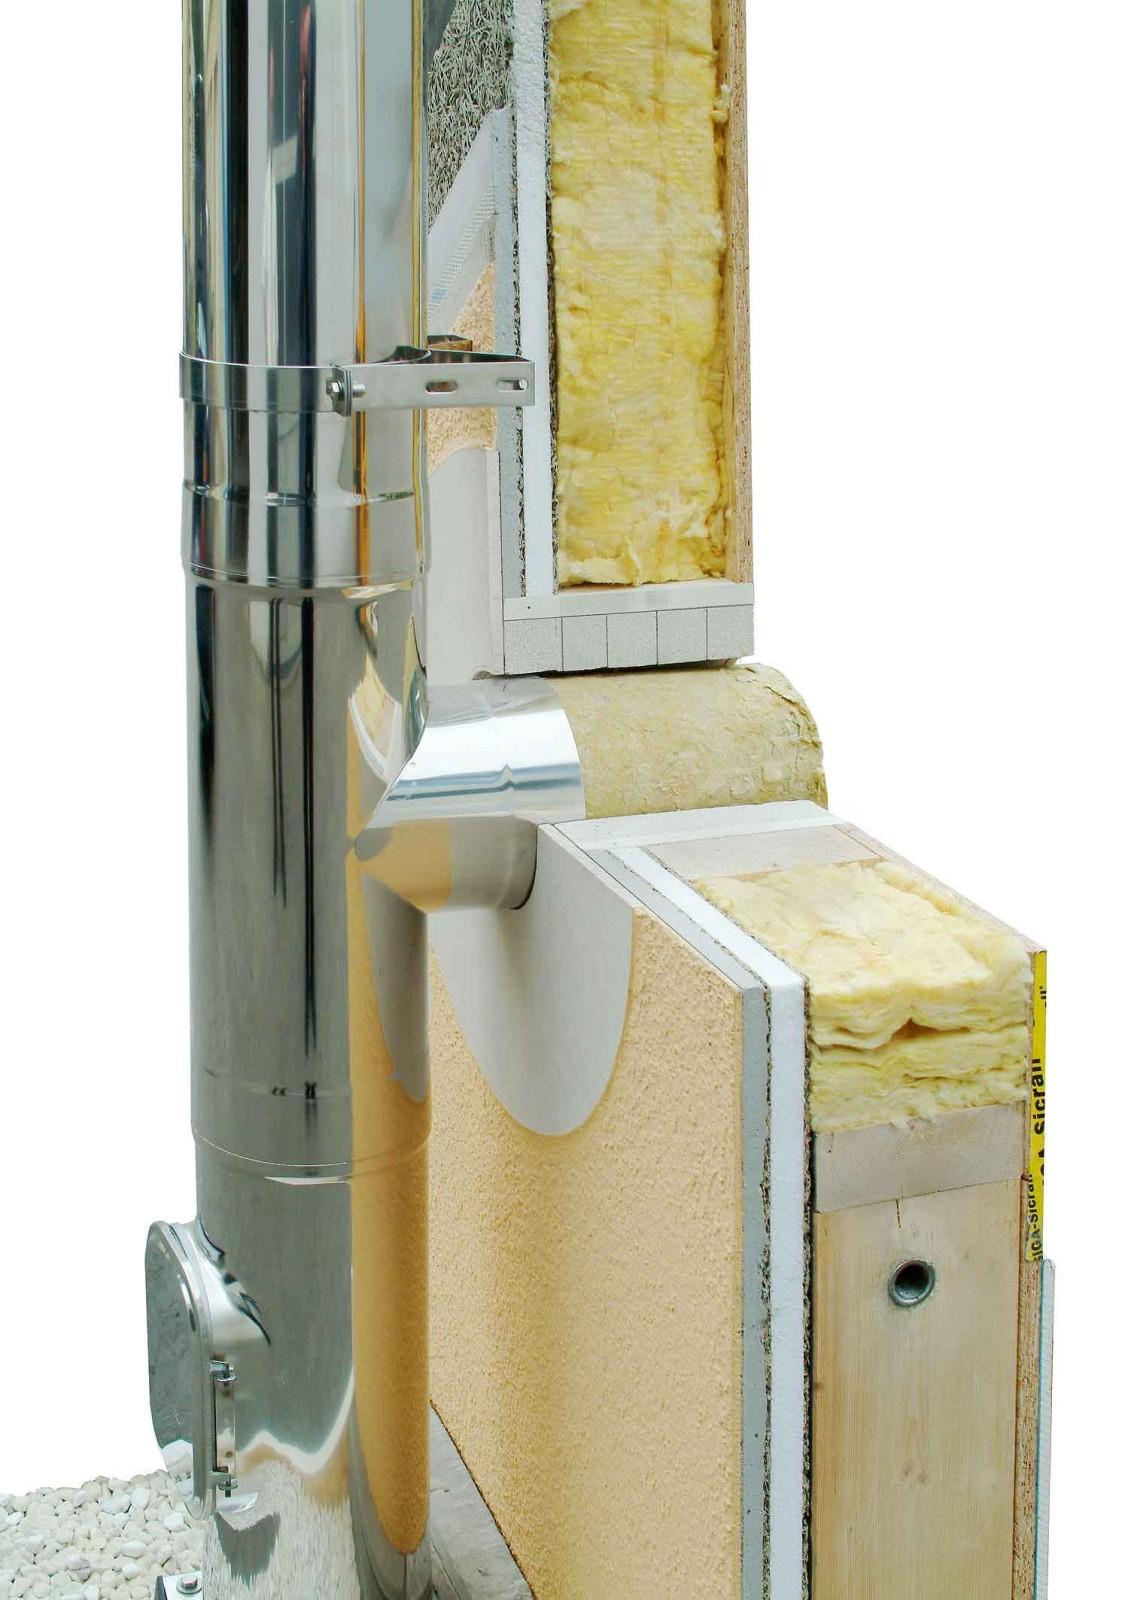 wanddurchf hrung raab bis 120 mm wandst rke schornstein. Black Bedroom Furniture Sets. Home Design Ideas